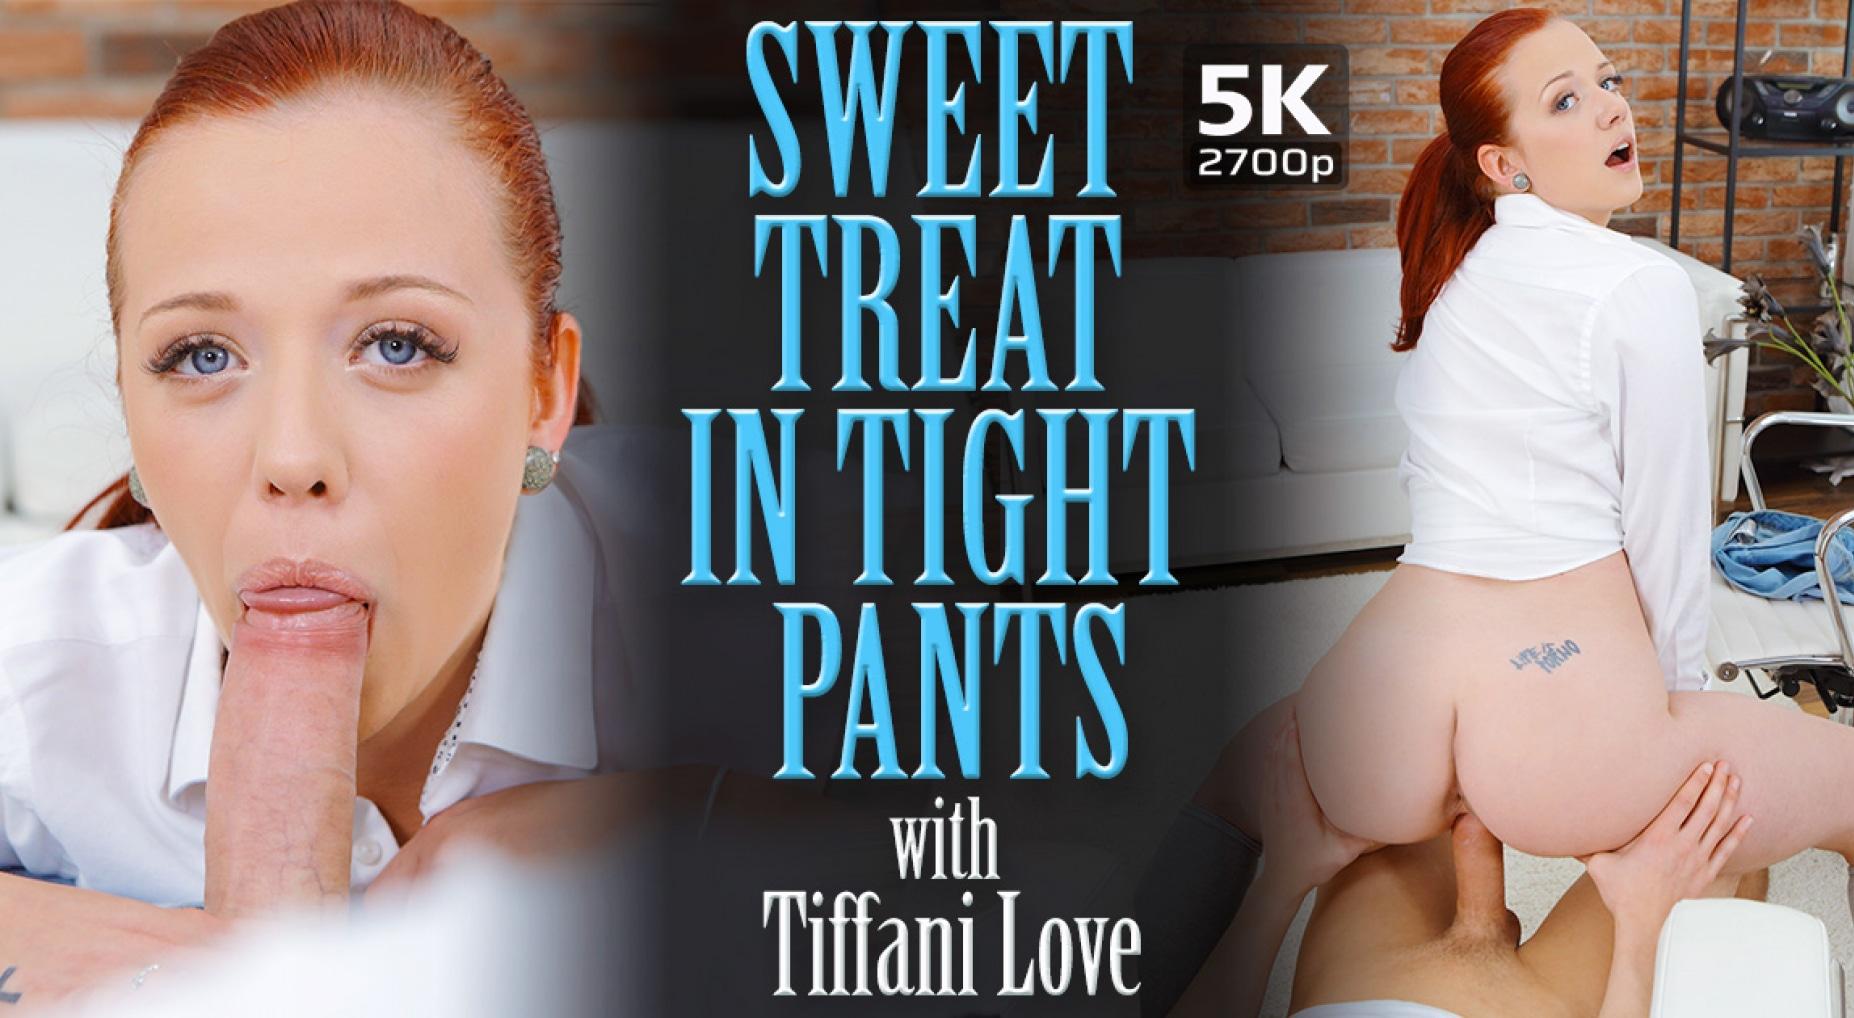 Sweet Treat In Tight Pants - Fair Skinned Redhead